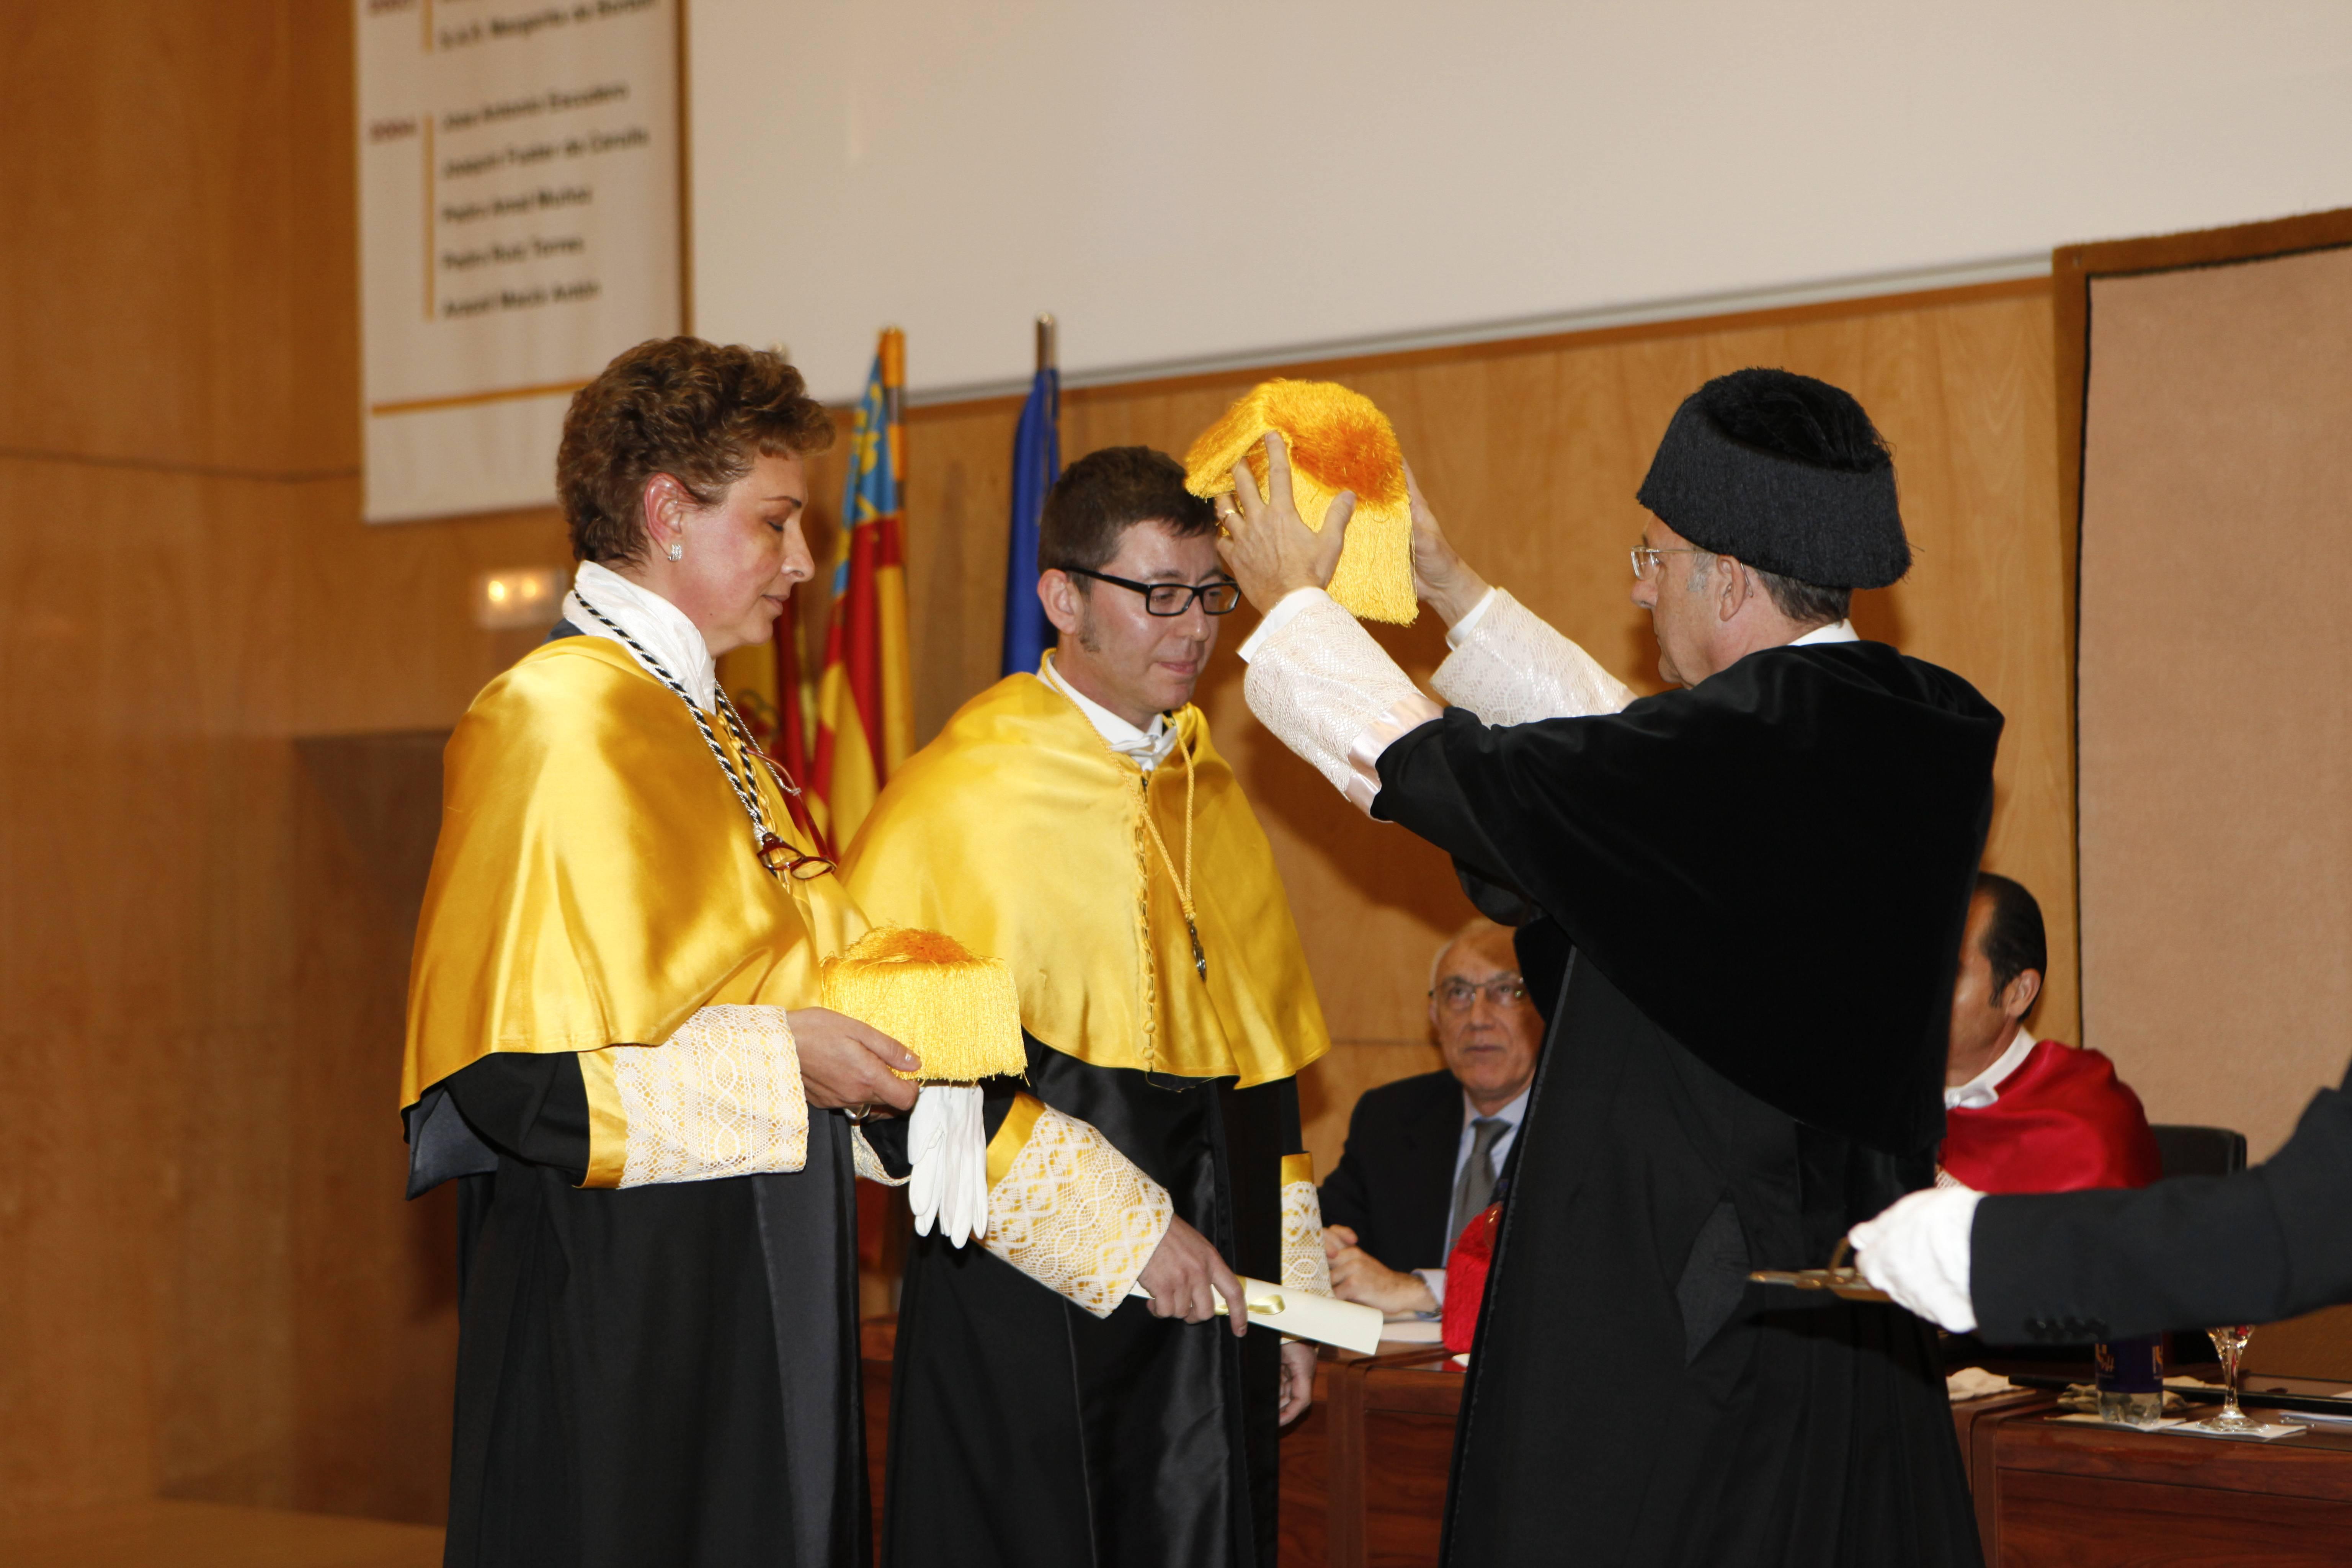 doctor-honoris-causa-luis-gamir_mg_1124.jpg